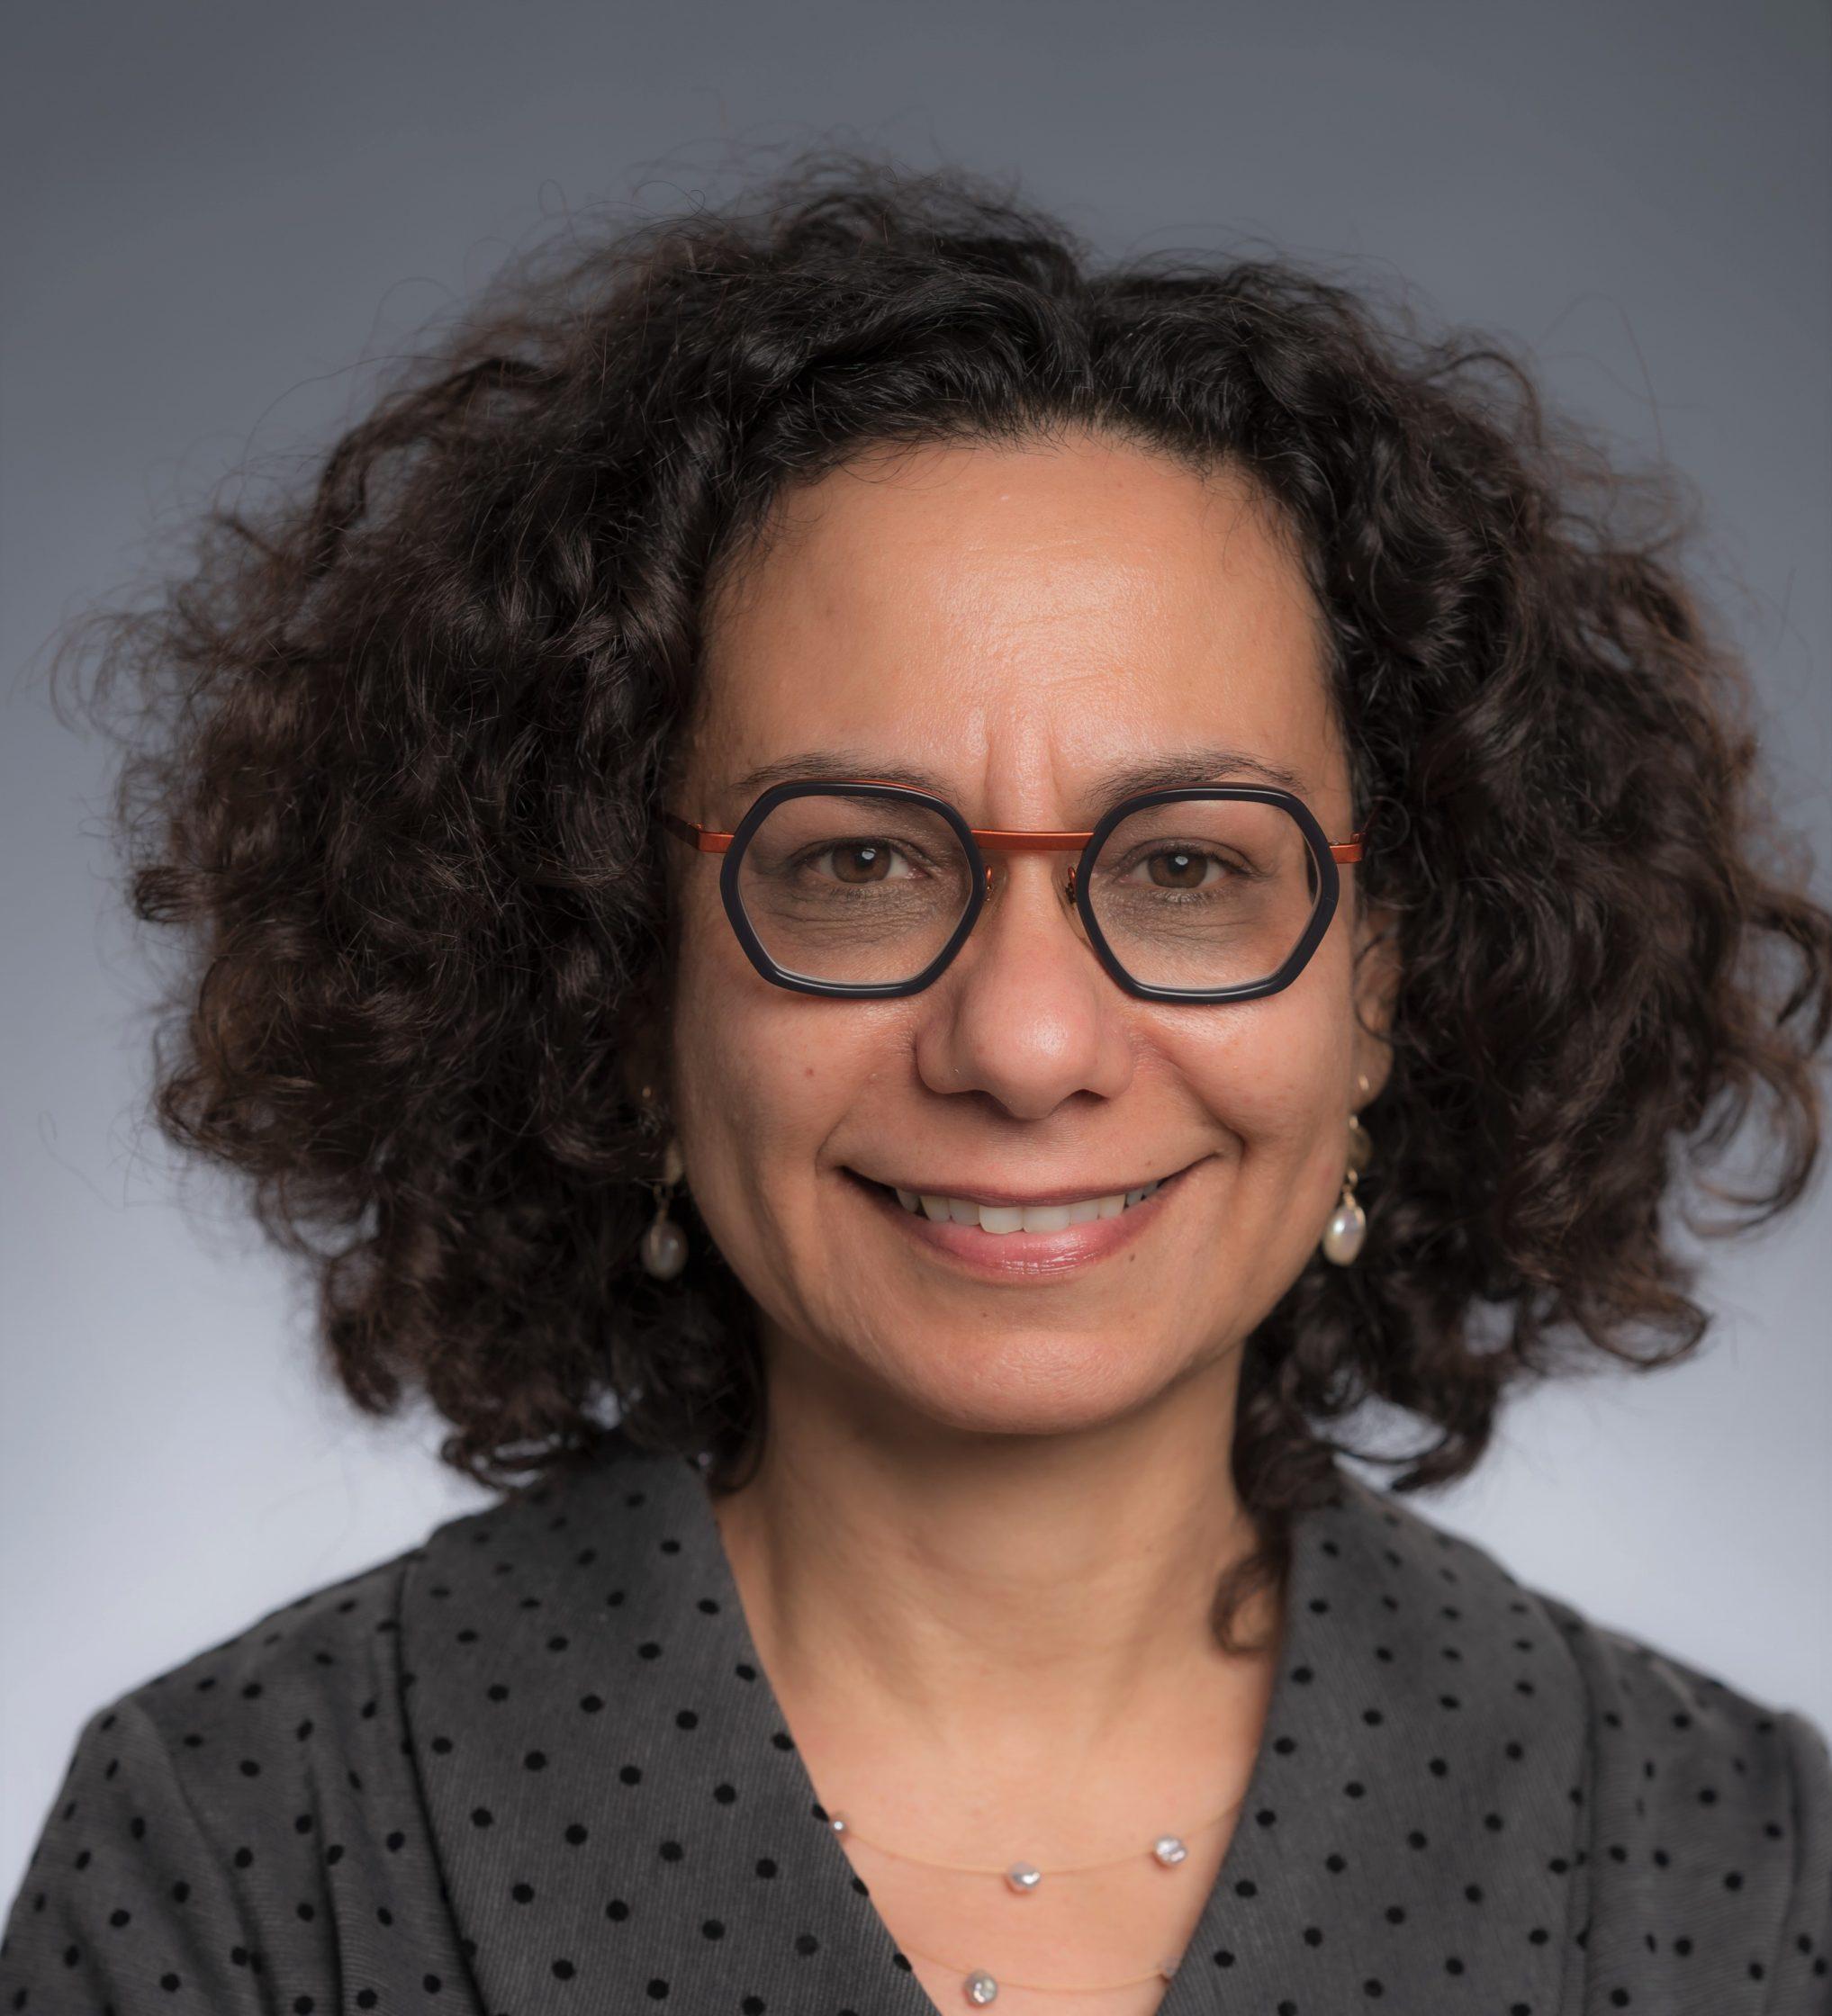 Dr. Sarai Aharoni